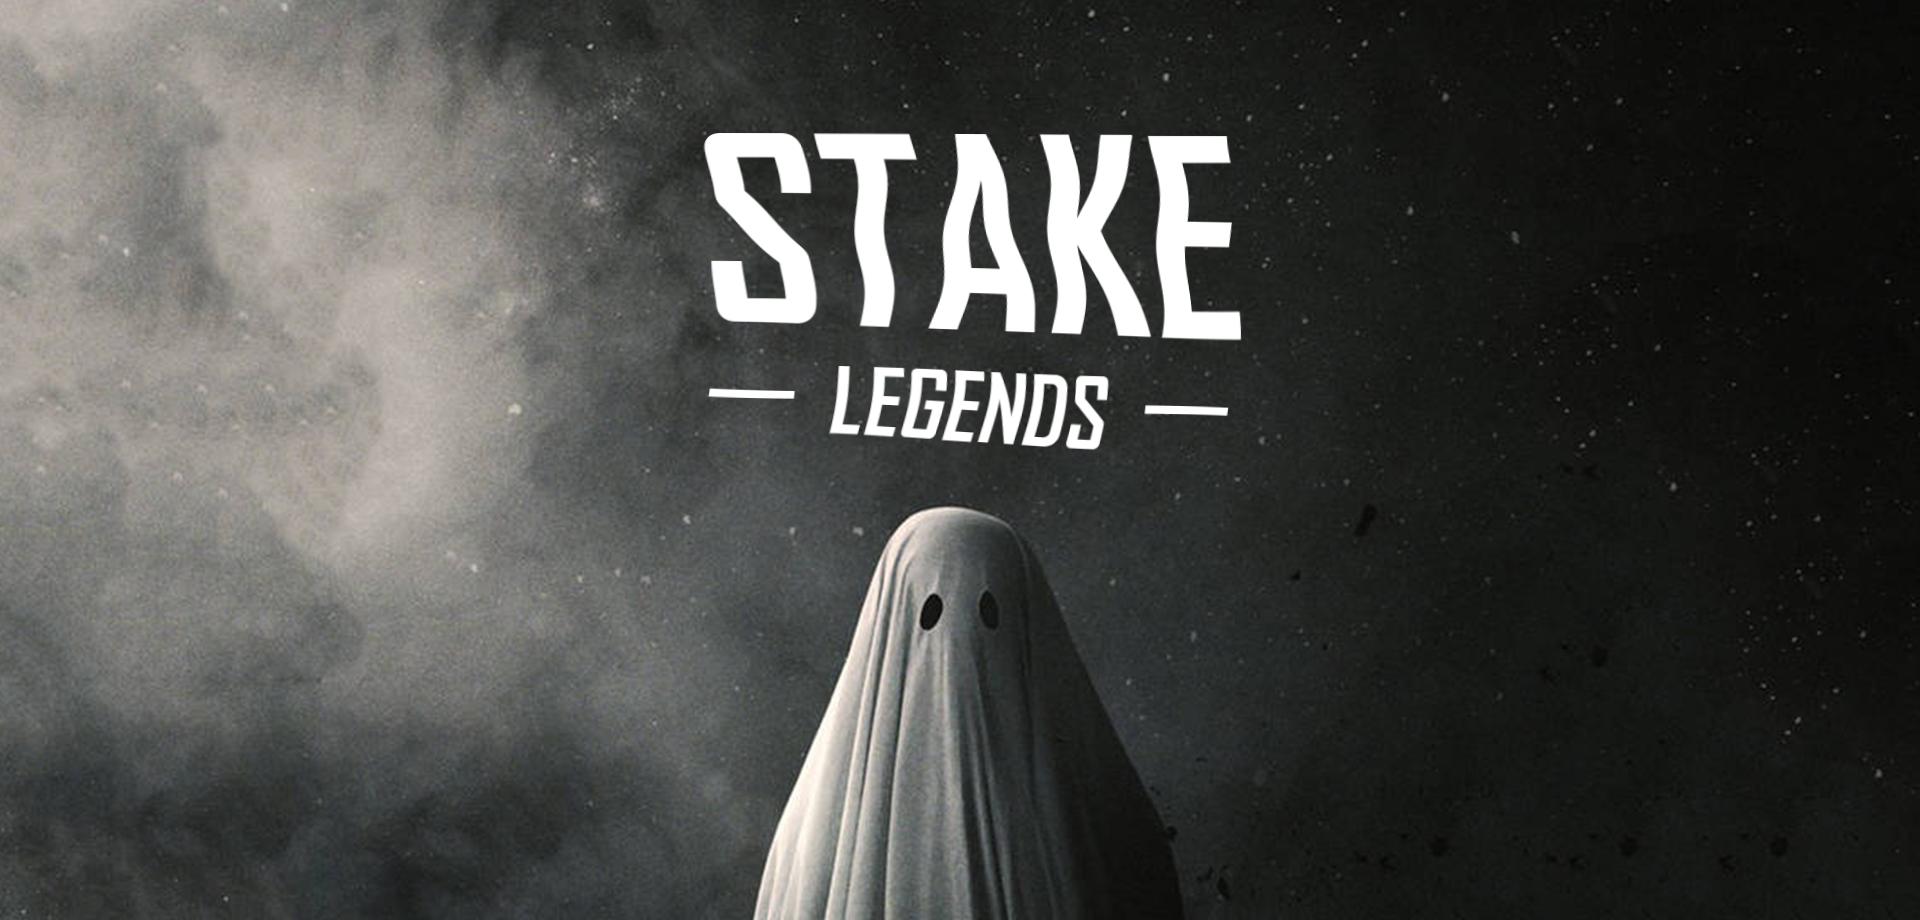 Stake Legends showcase